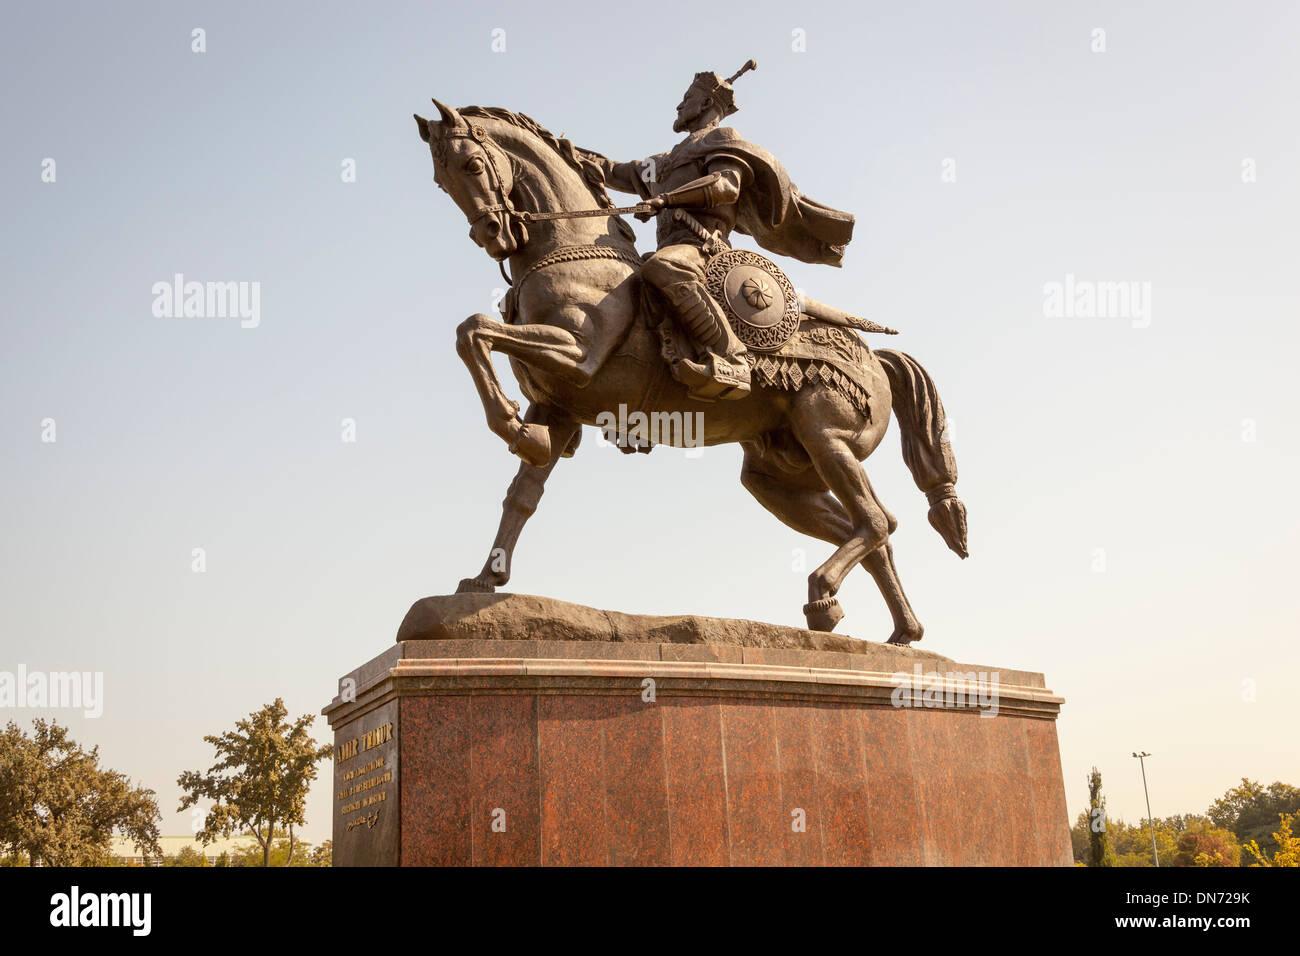 Statue of Amir Timur, also known as Temur and Tamerlane, Tashkent, Uzbekistan Stock Photo